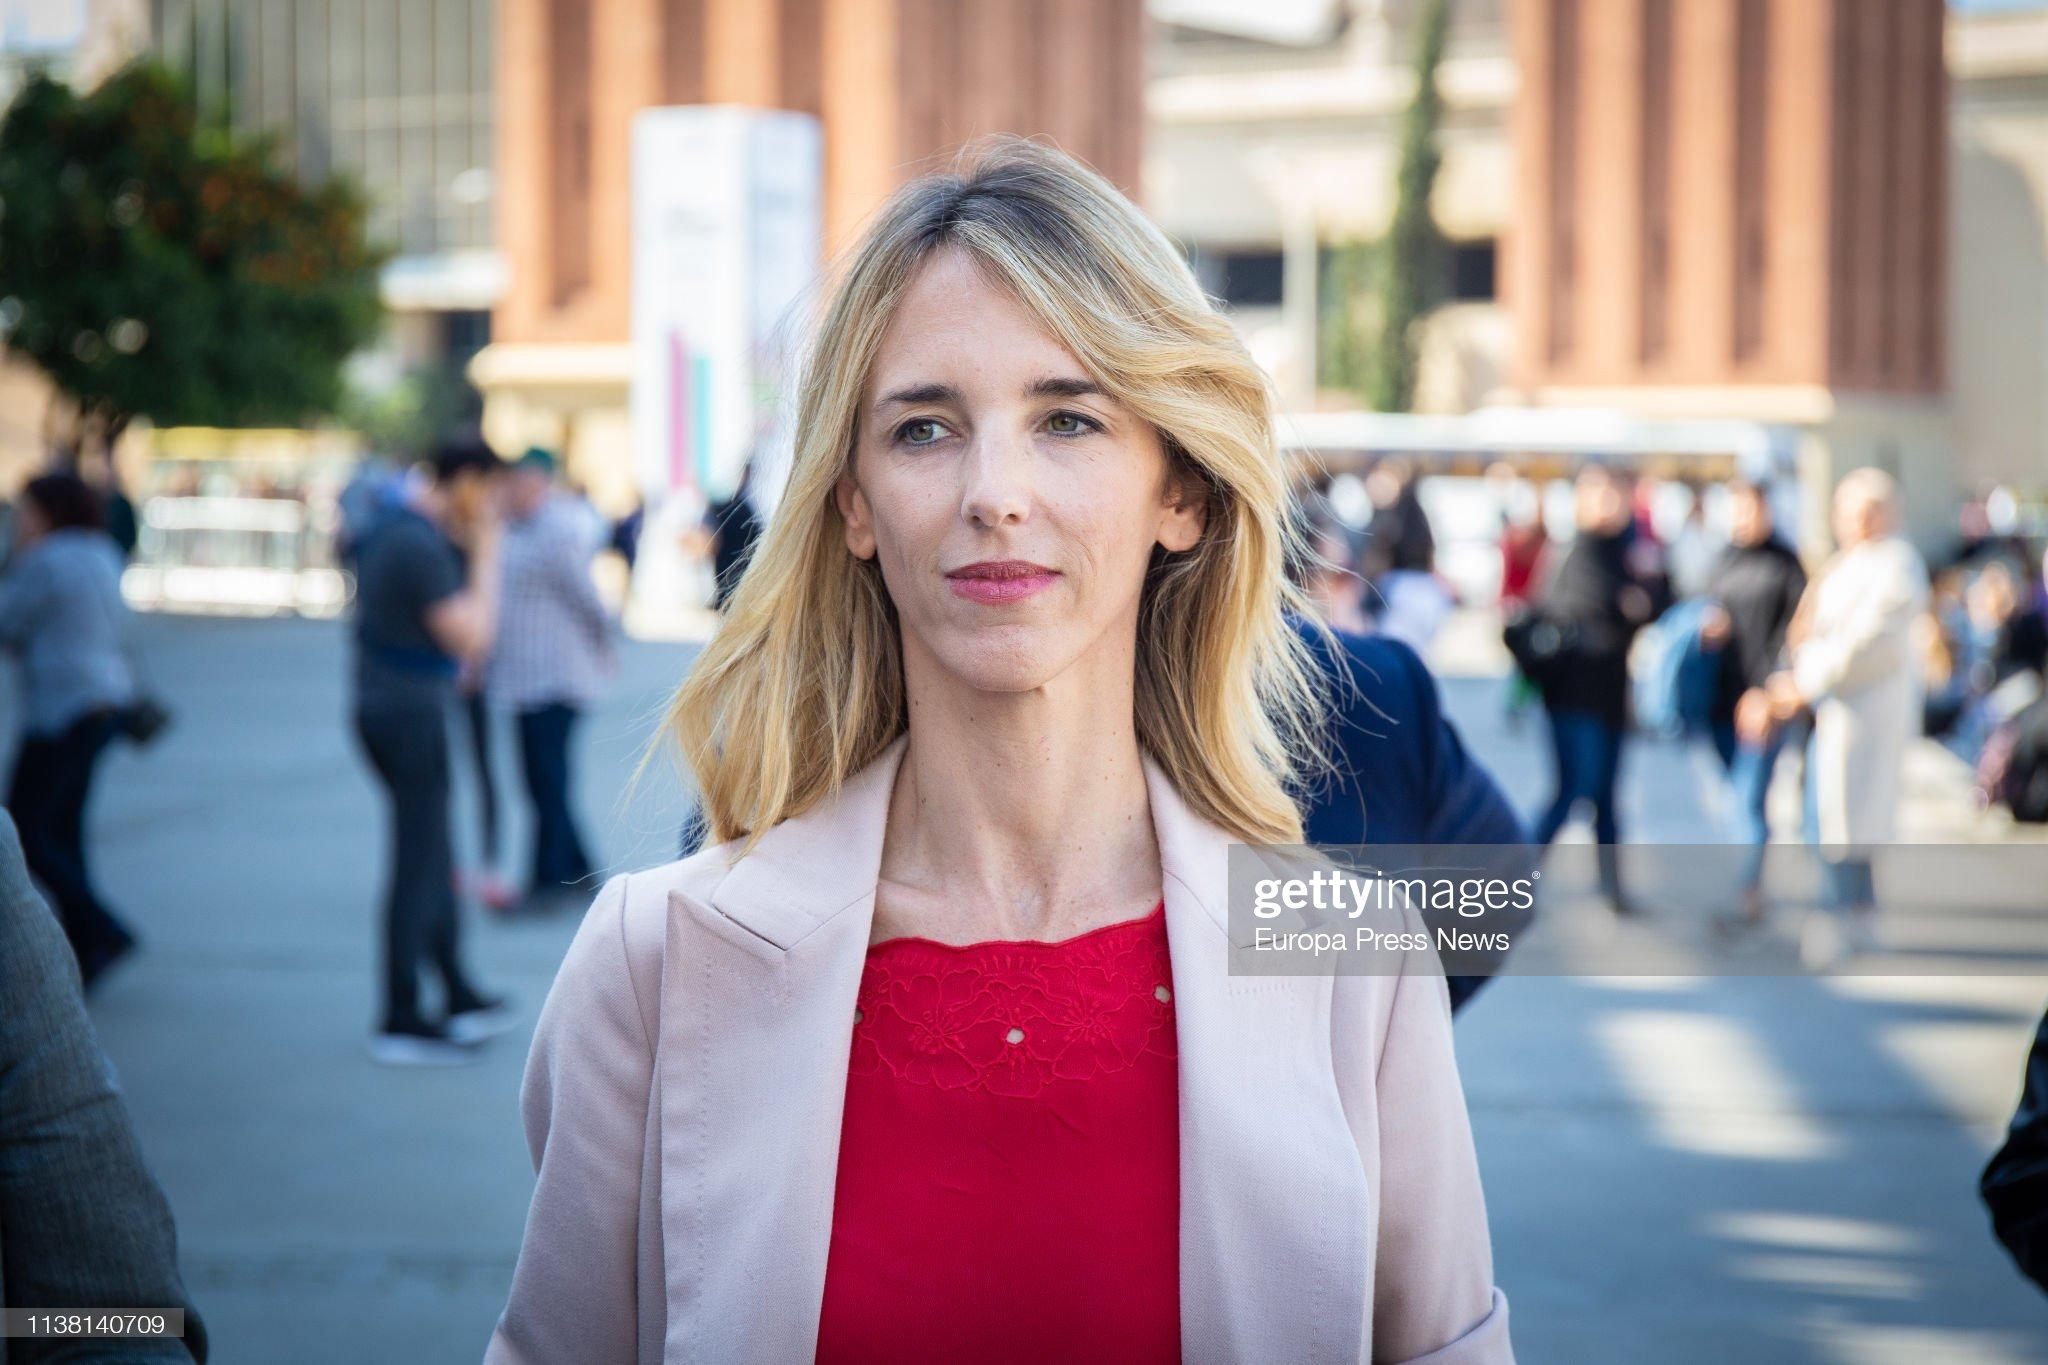 ¿Cuánto mide Cayetana Álvarez de Toledo? - Altura The-lead-candidate-of-pp-in-barcelona-cayetana-alvarez-de-toledo-is-picture-id1138140709?s=2048x2048